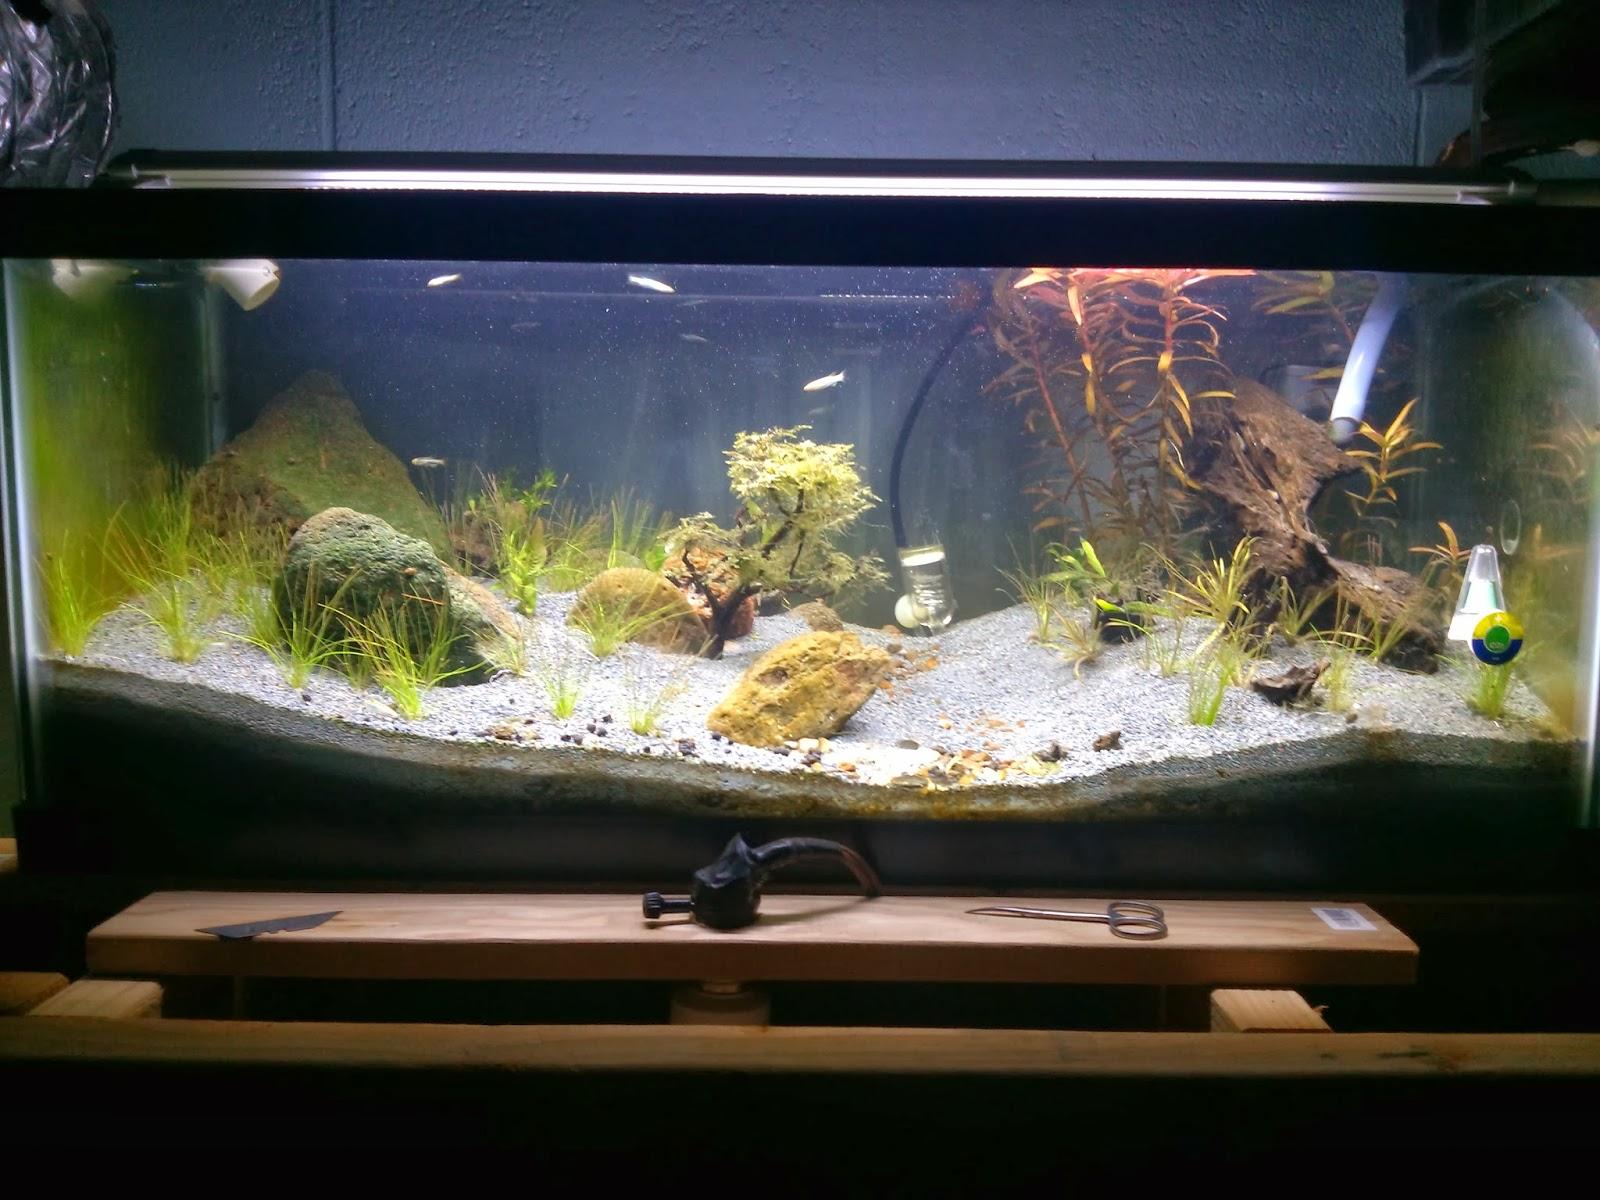 Aquarium journal 20 gallon long asian sp update for 30 gallon long fish tank